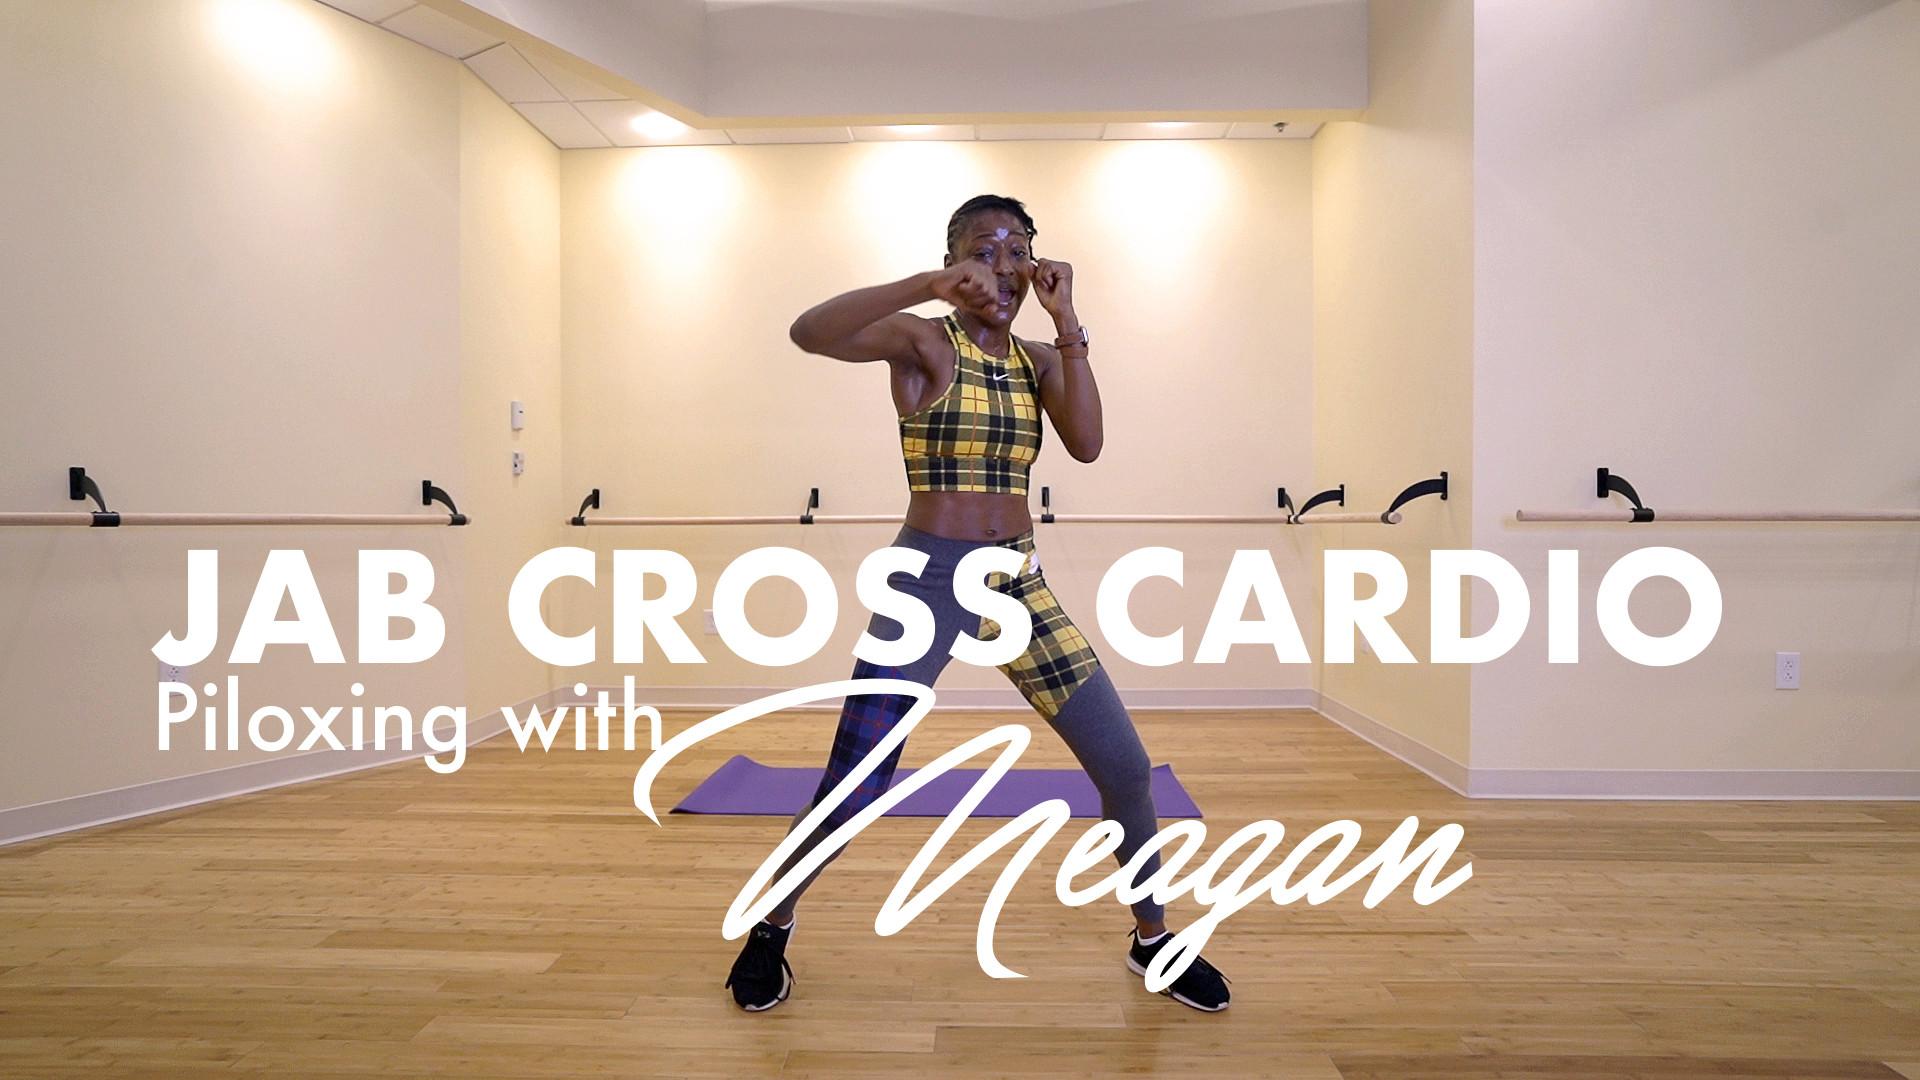 JAB CROSS CARDIO: MEAGAN